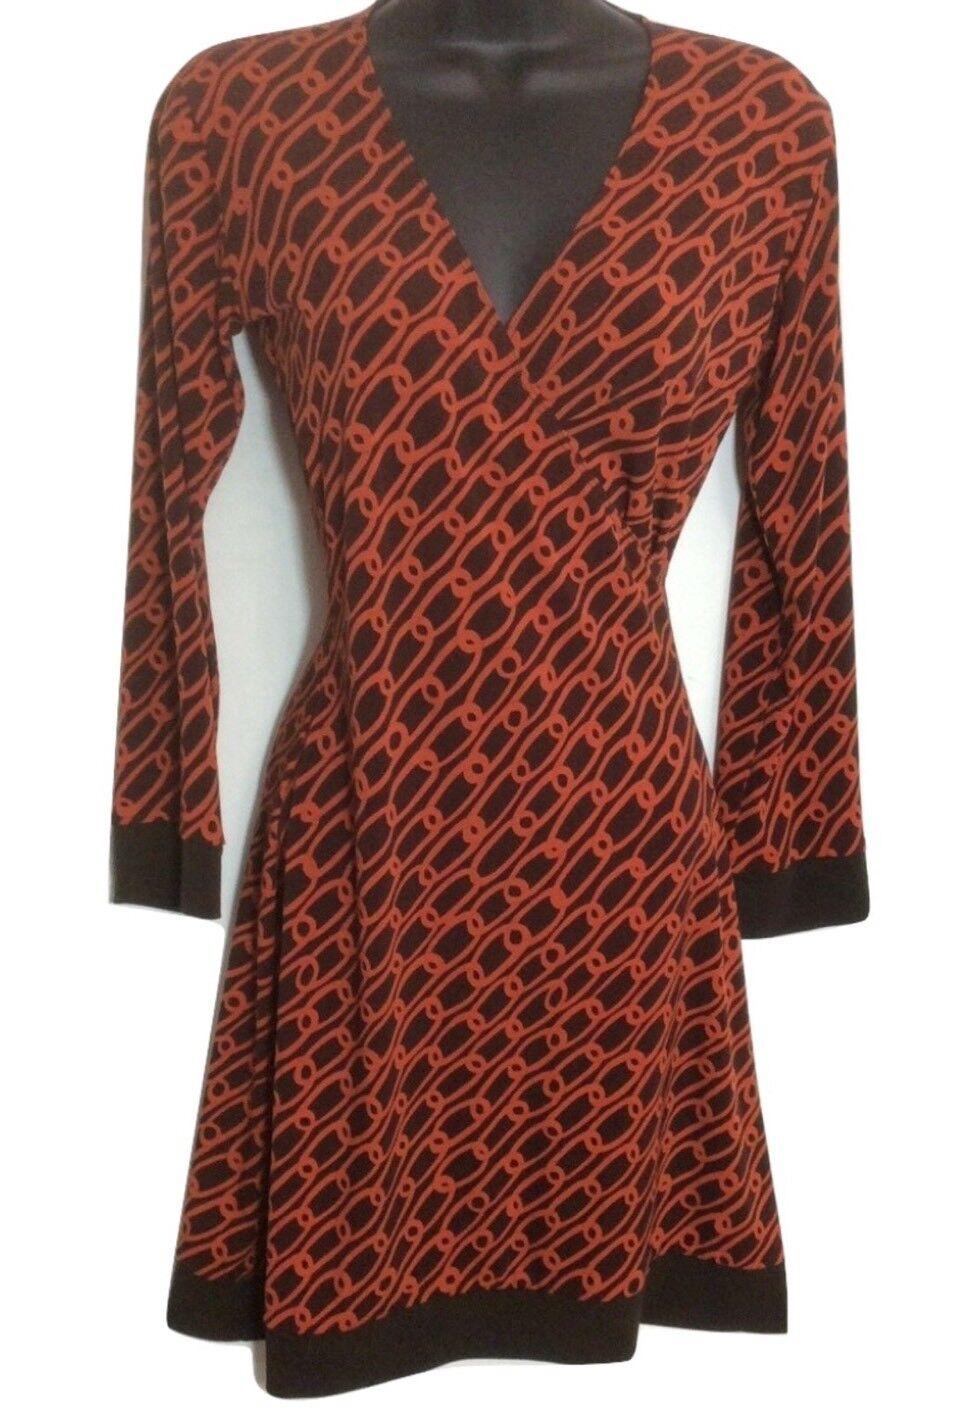 Huminska NY Faux Wrap Dress Size 0 Paper Clip Print orange Brn Tiny Defect